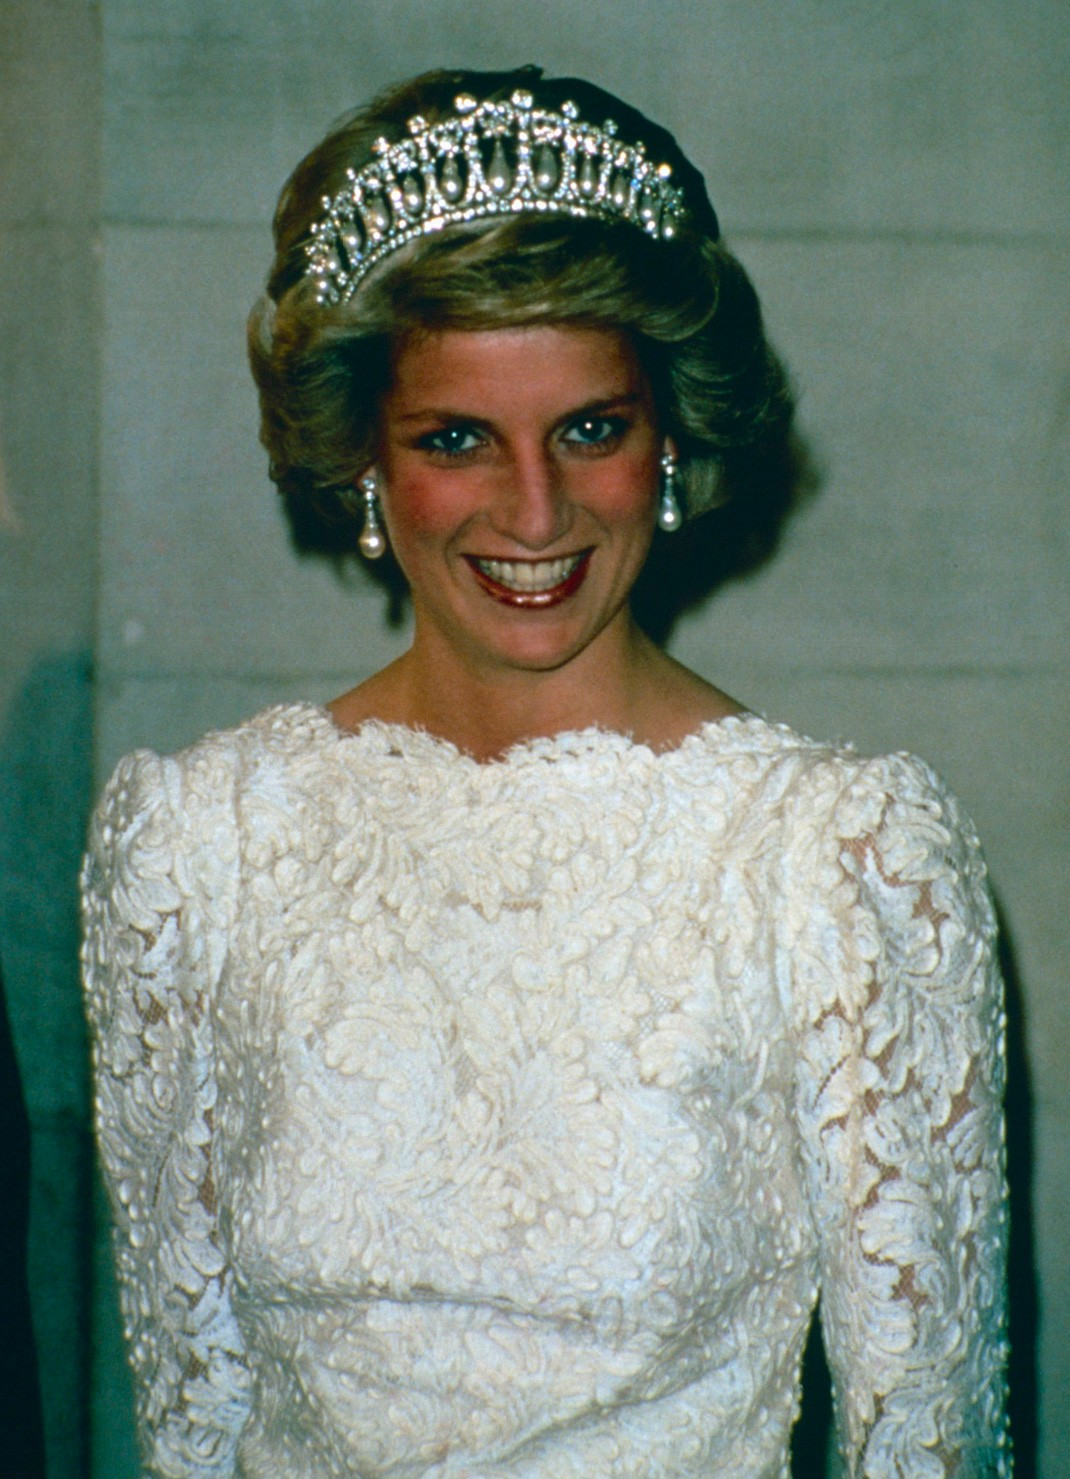 8530789a15 Kate vuelve a rendir homenaje a Lady Di con su tiara favorita